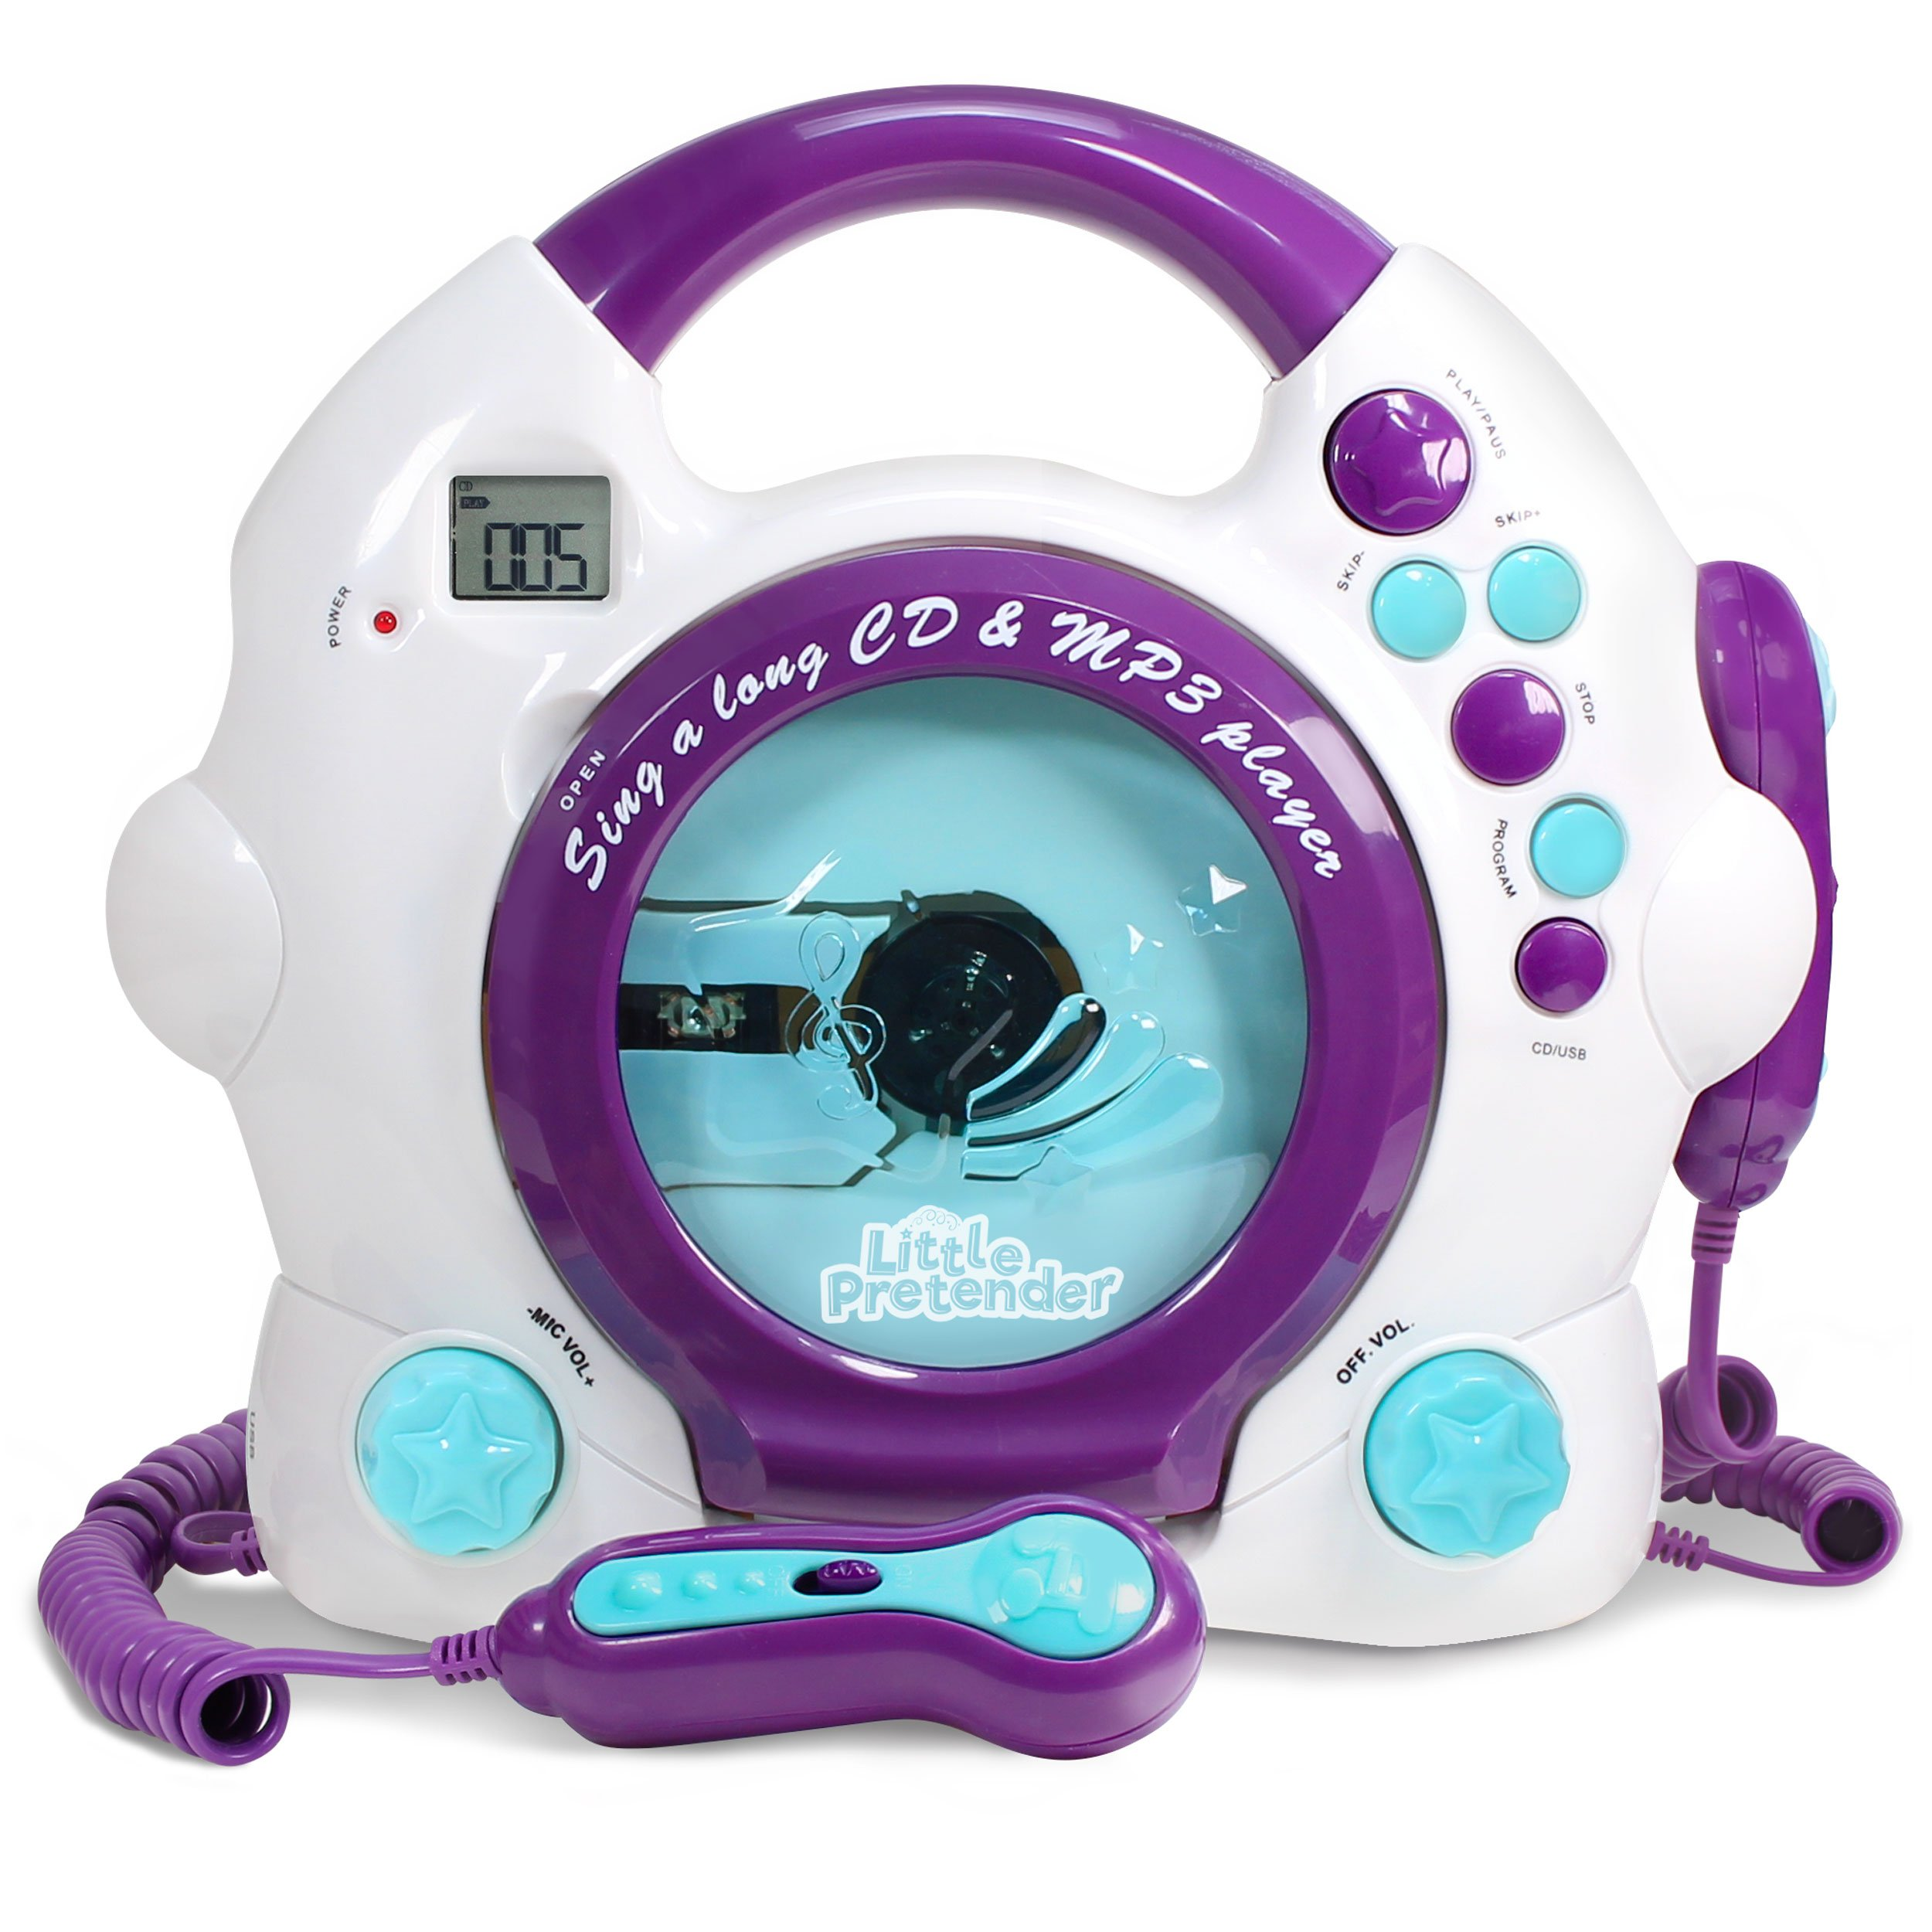 b70e3789b49e Little Pretender Kids Karaoke Machine - CD   MP3 Player Sing-A-Long Music  Player with 2 Microphones